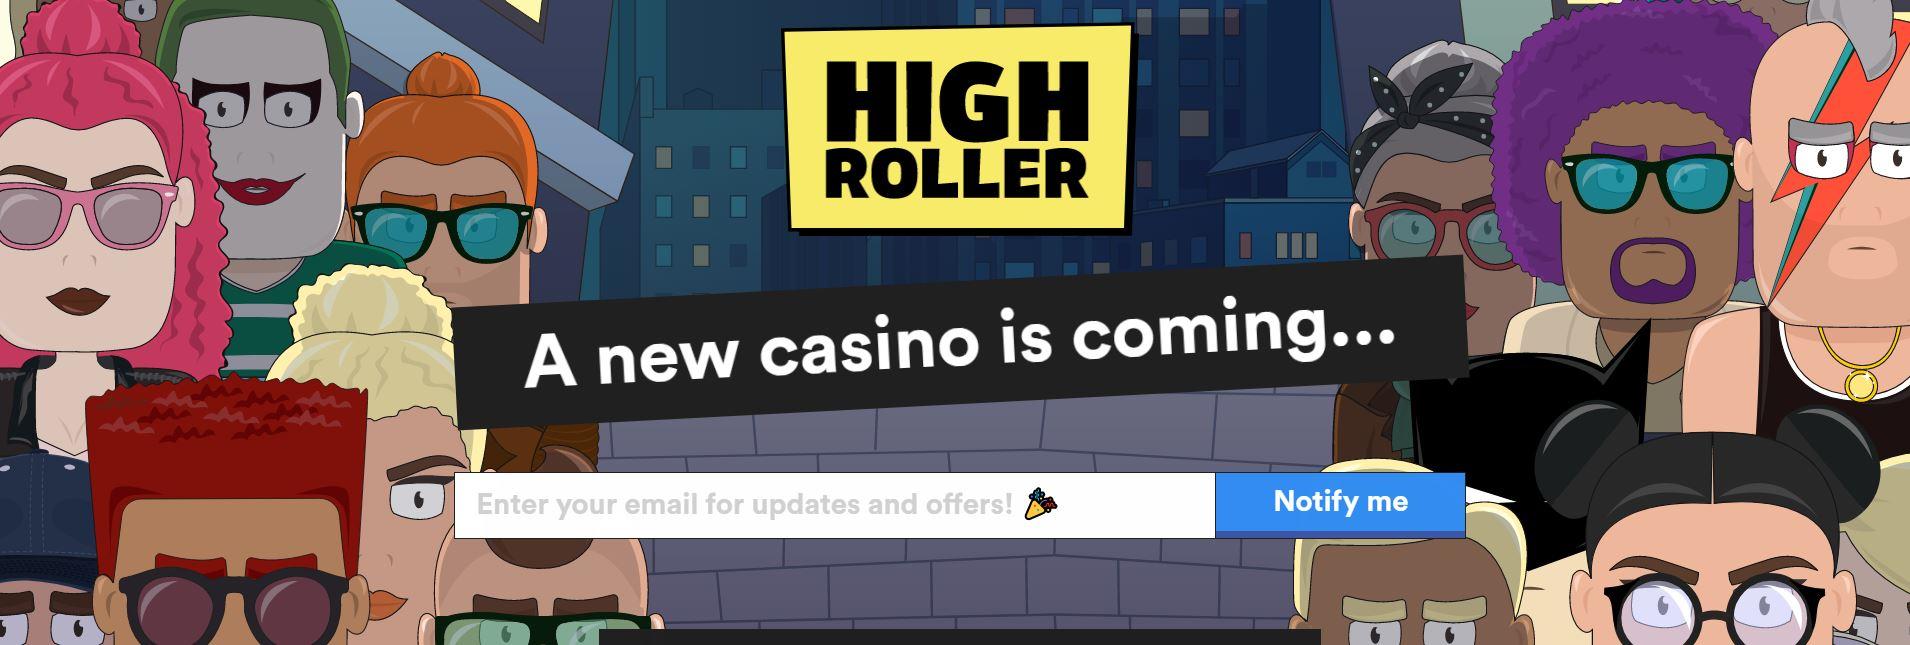 Live Casino Blackjack High Roller - NetEnt - Rizk Casino Deutschland